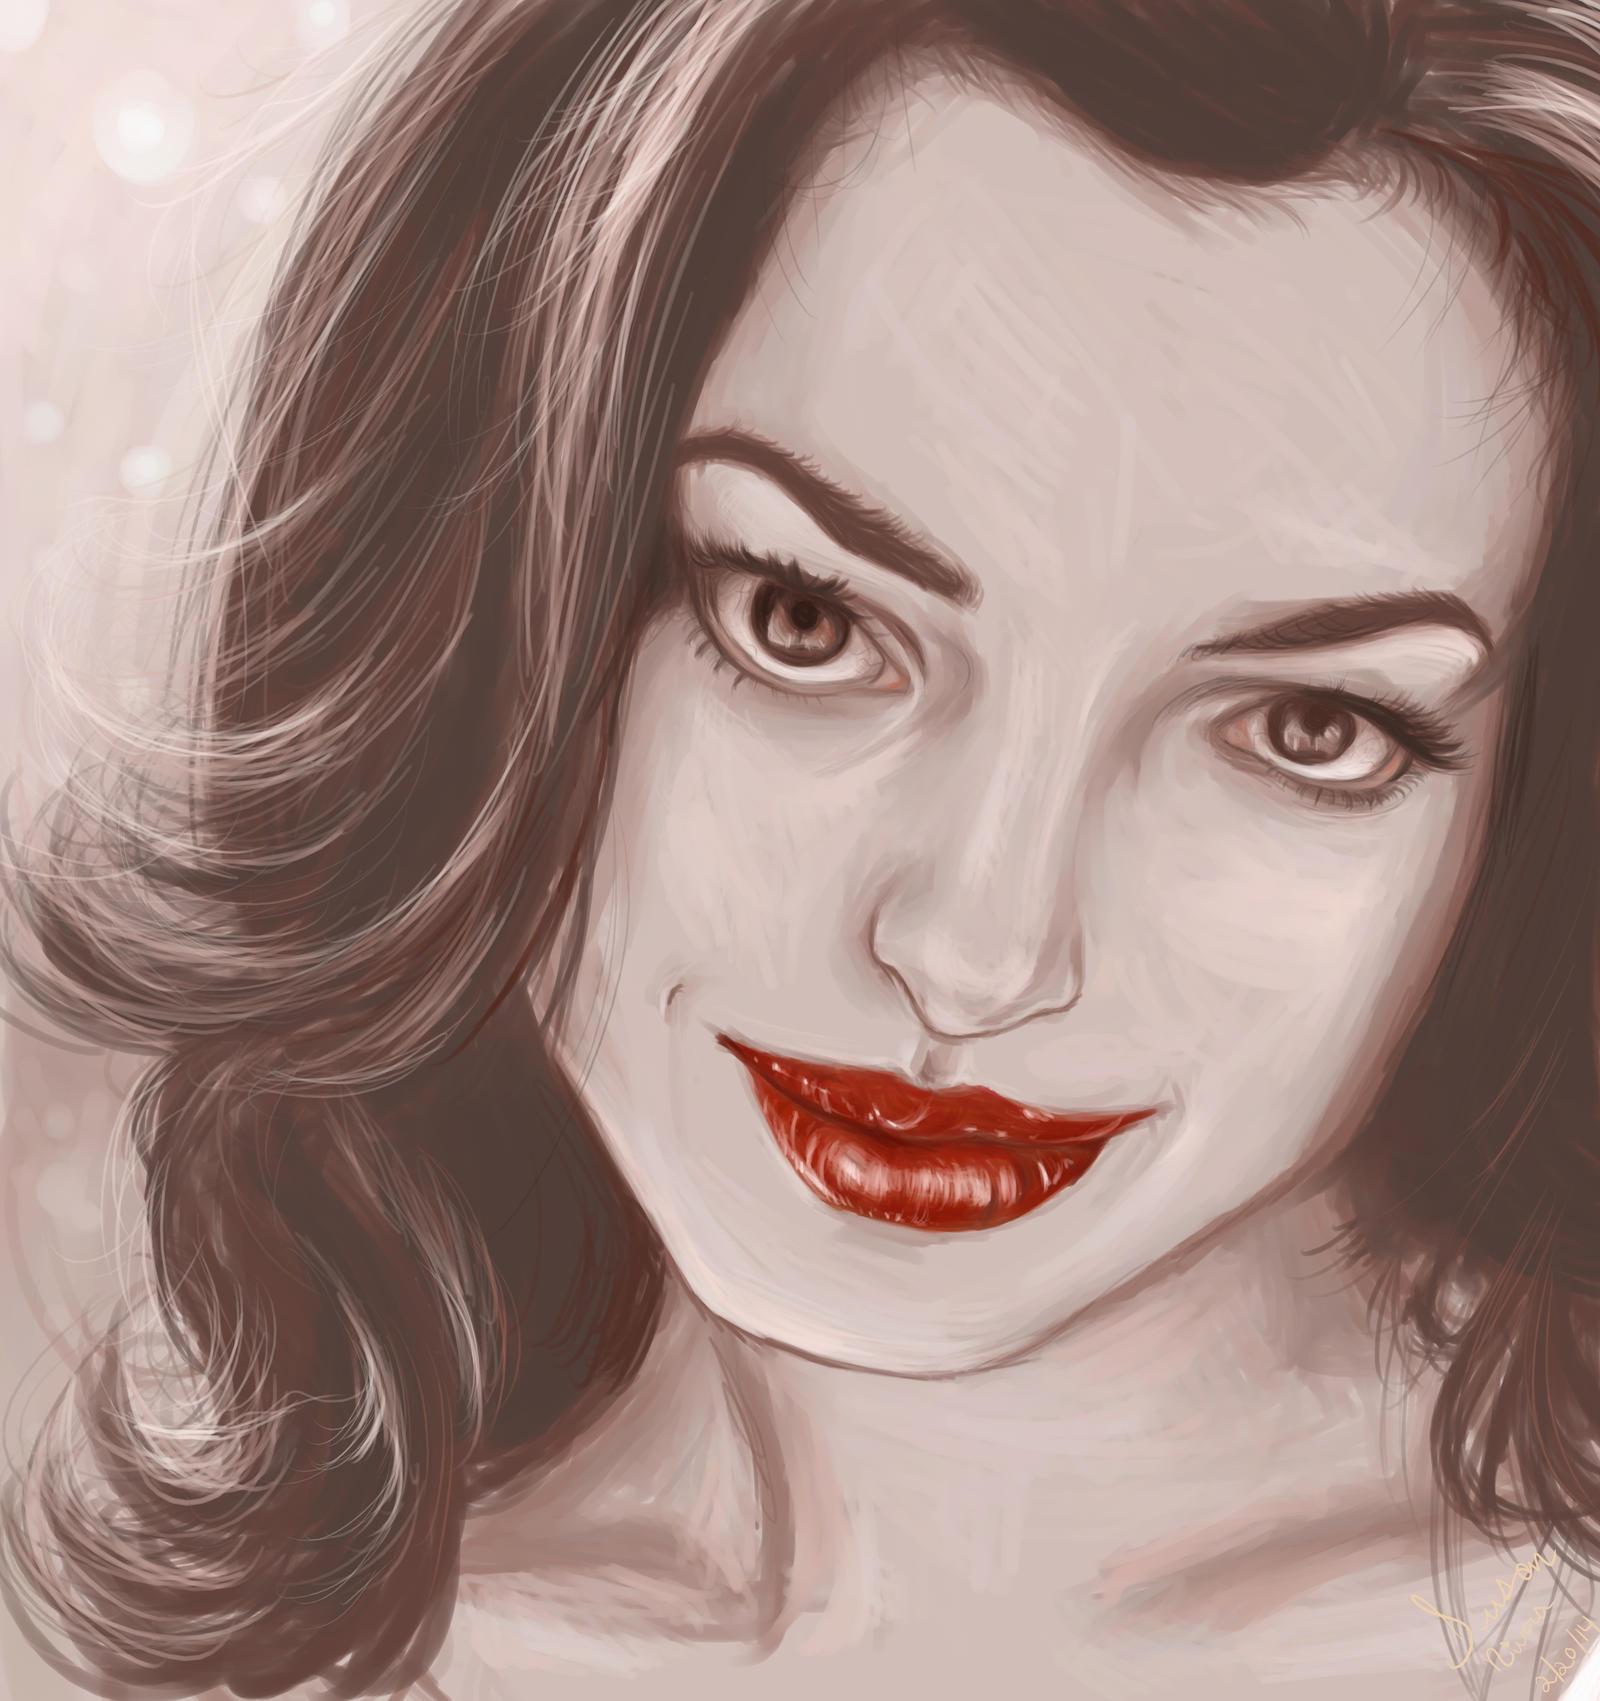 Anne Hathaway Drawing: Anne Hathaway By Artfreaksue On DeviantArt